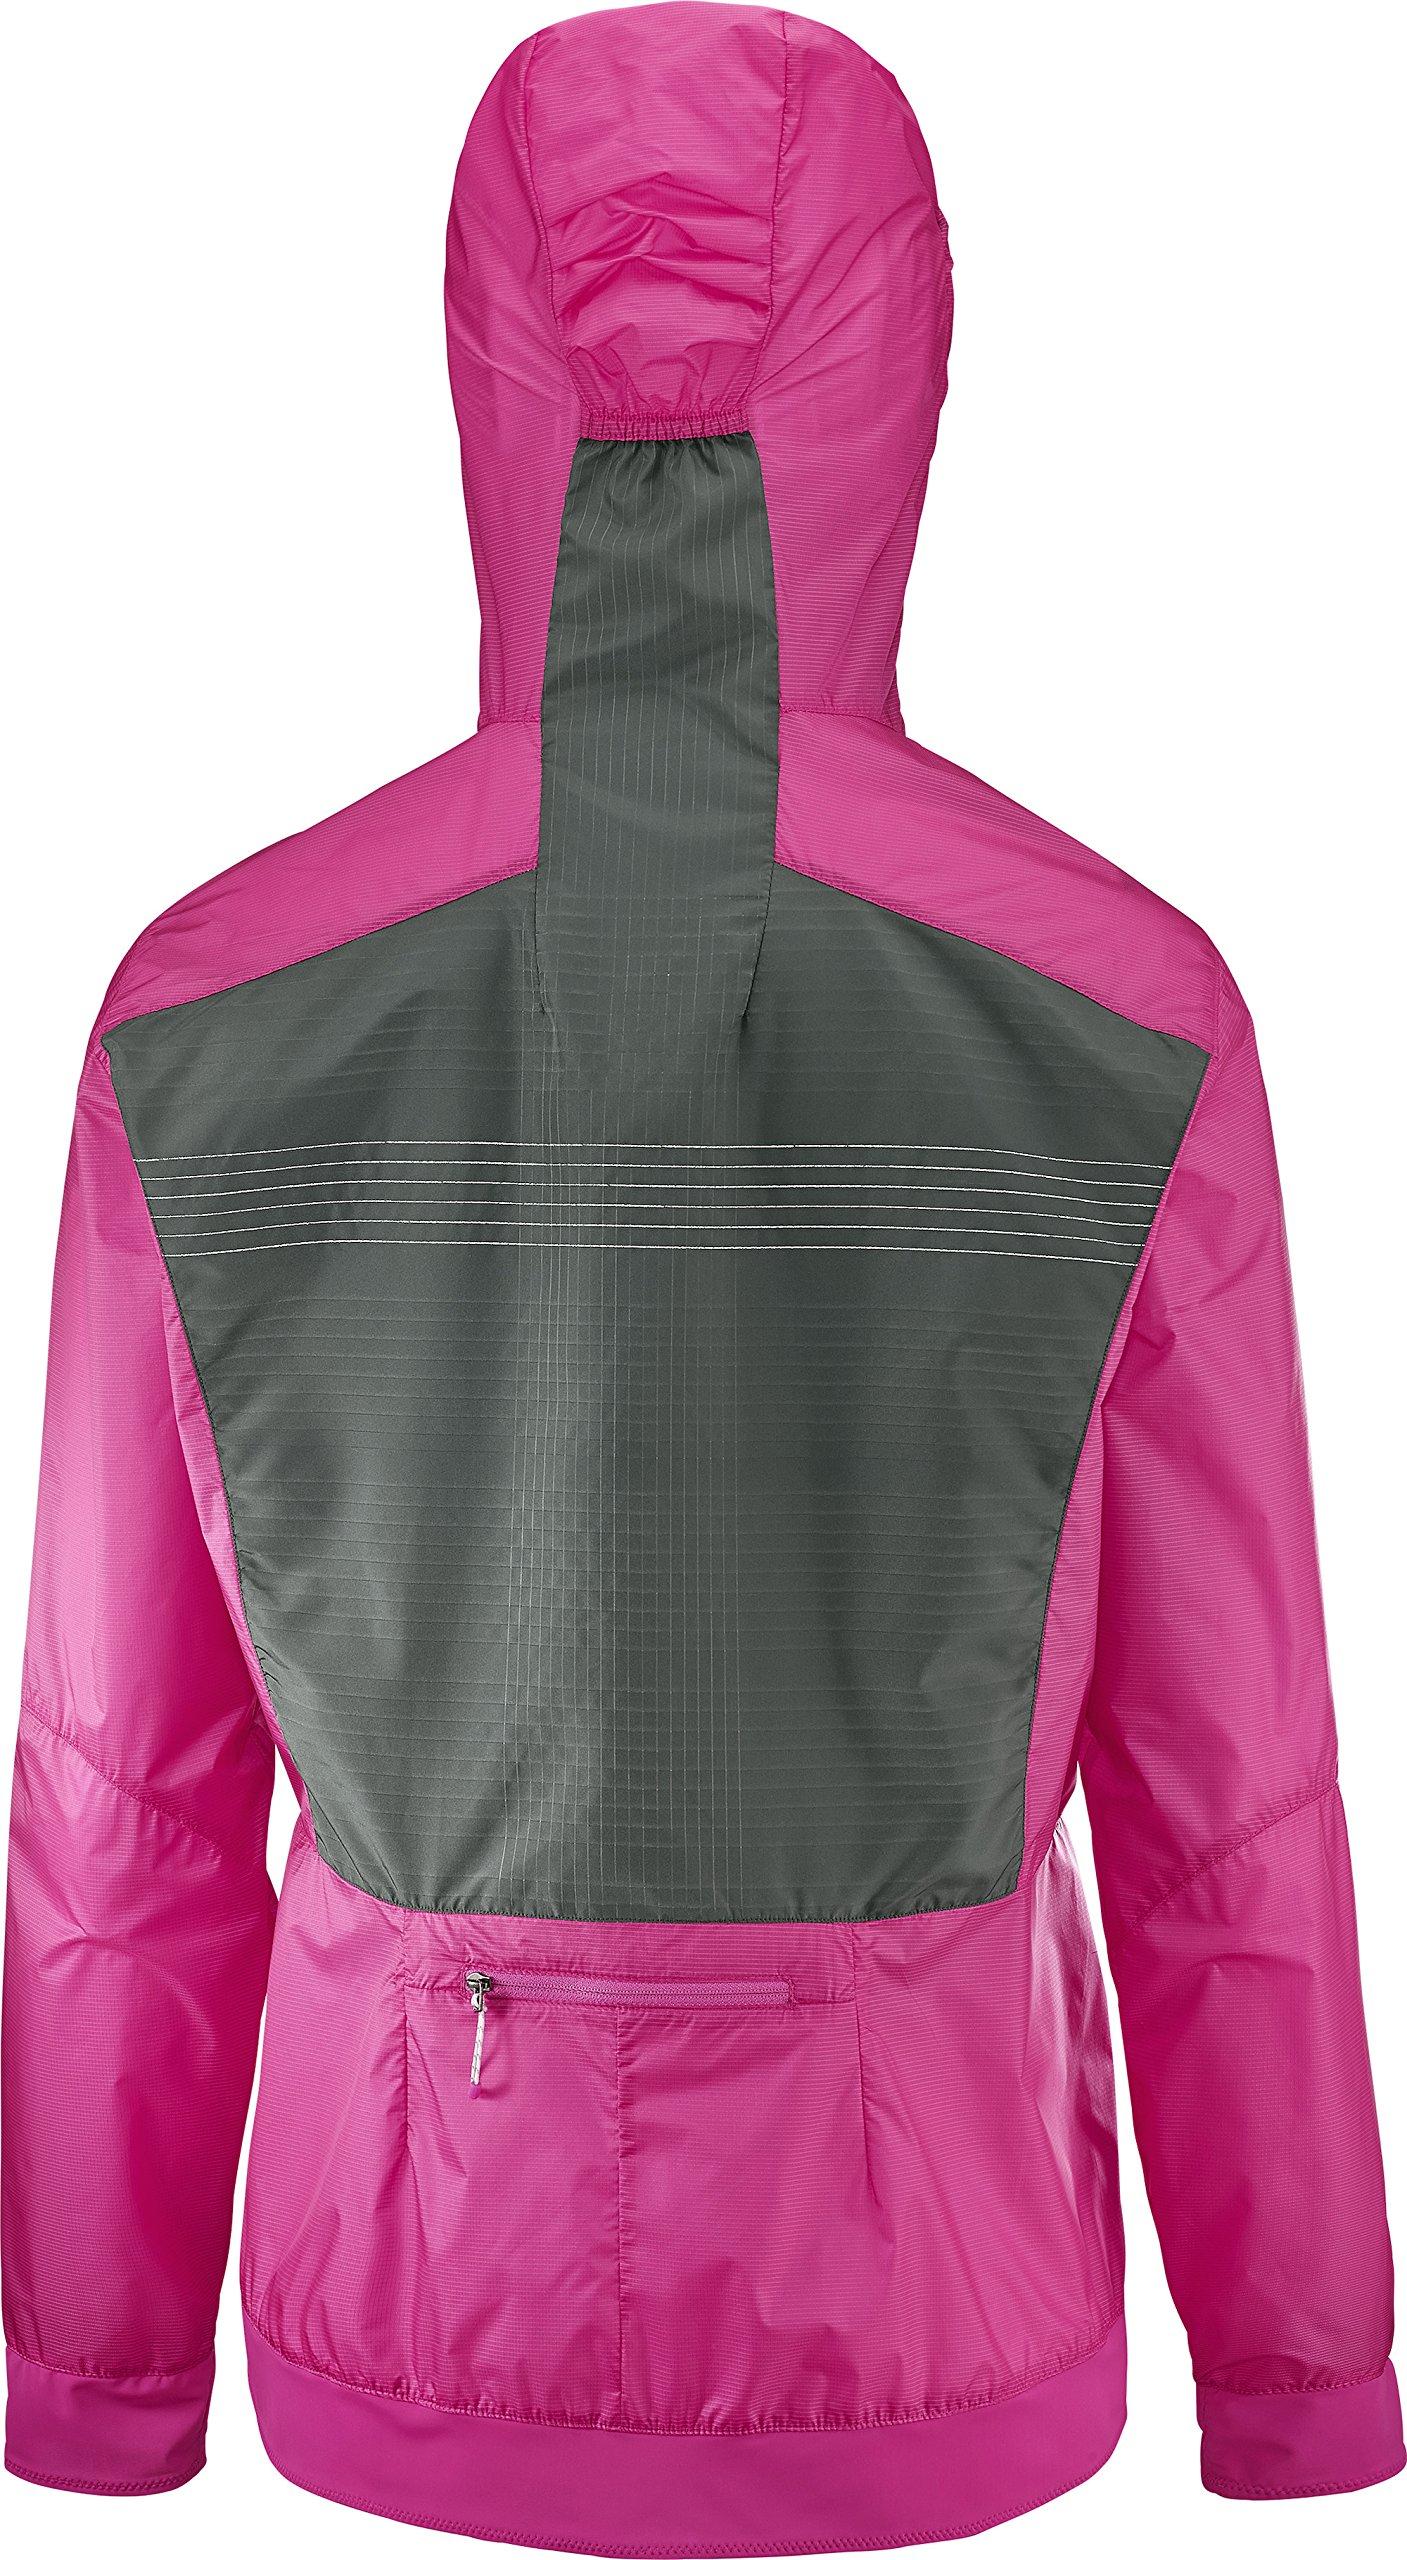 Salomon Women's Lightning Aero FZ Hoodie, Pink Yarrow, S by Salomon (Image #3)